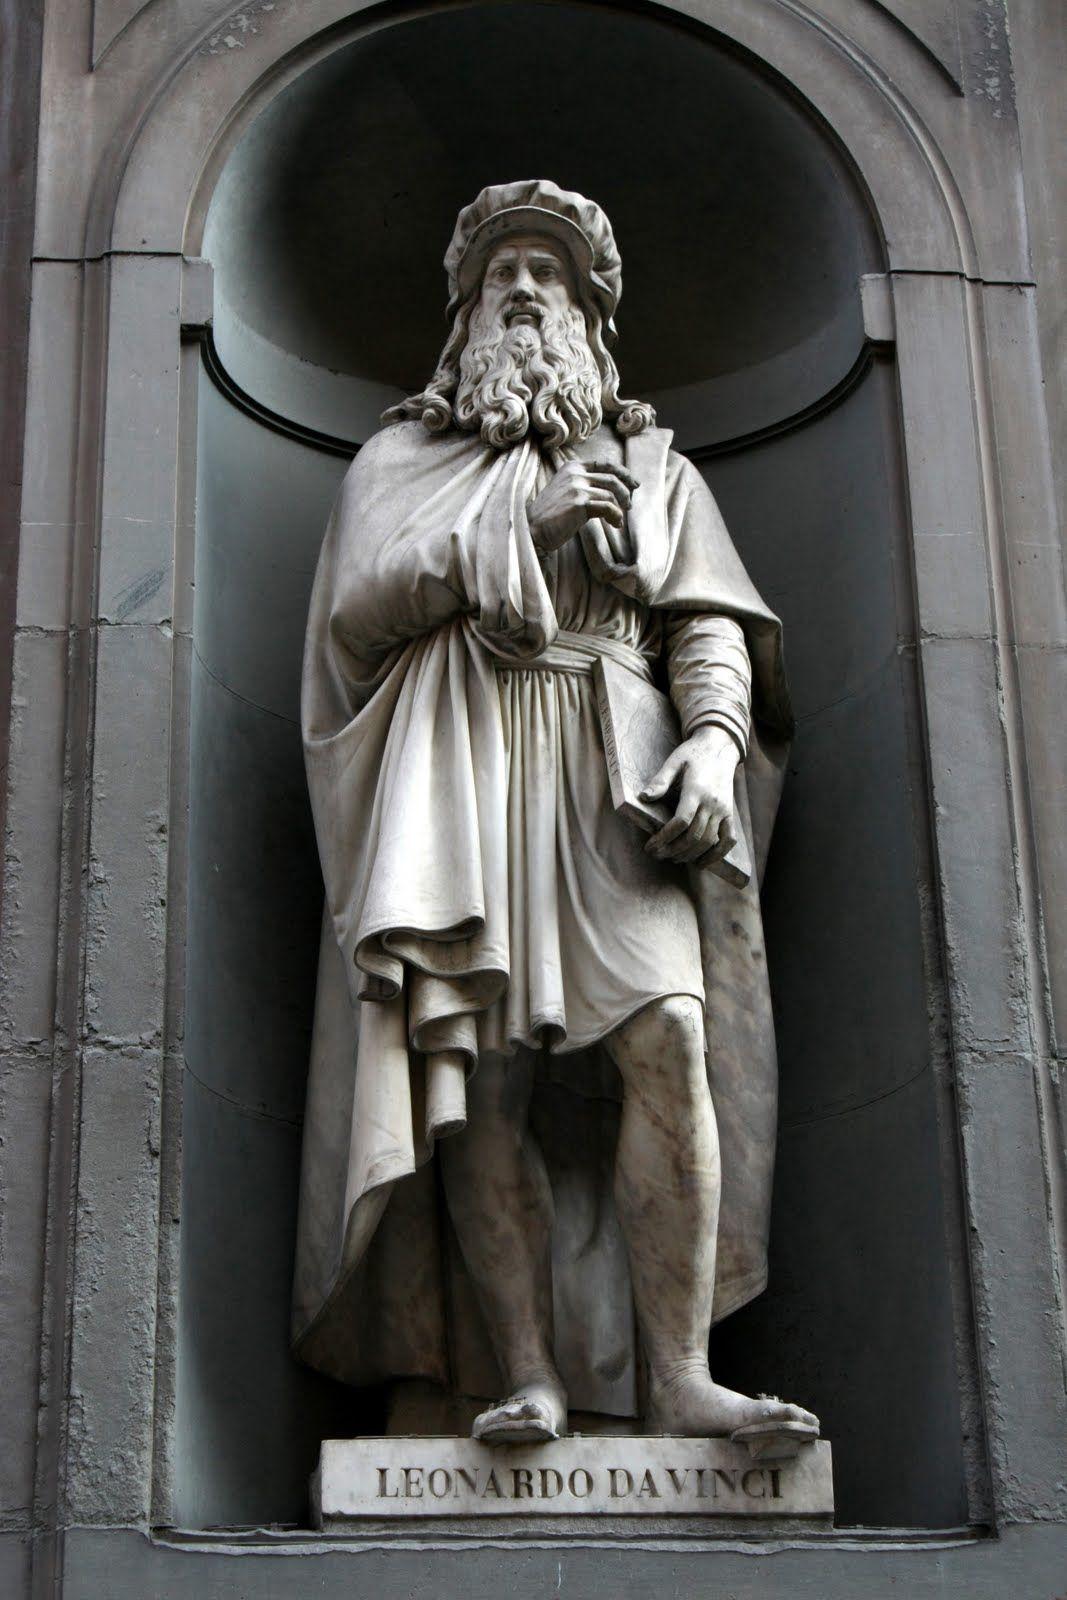 Sculpture De Léonard De Vinci Dans La Galerie Des Offices Statue Uffizi Gallery Leonardo Da Vinci